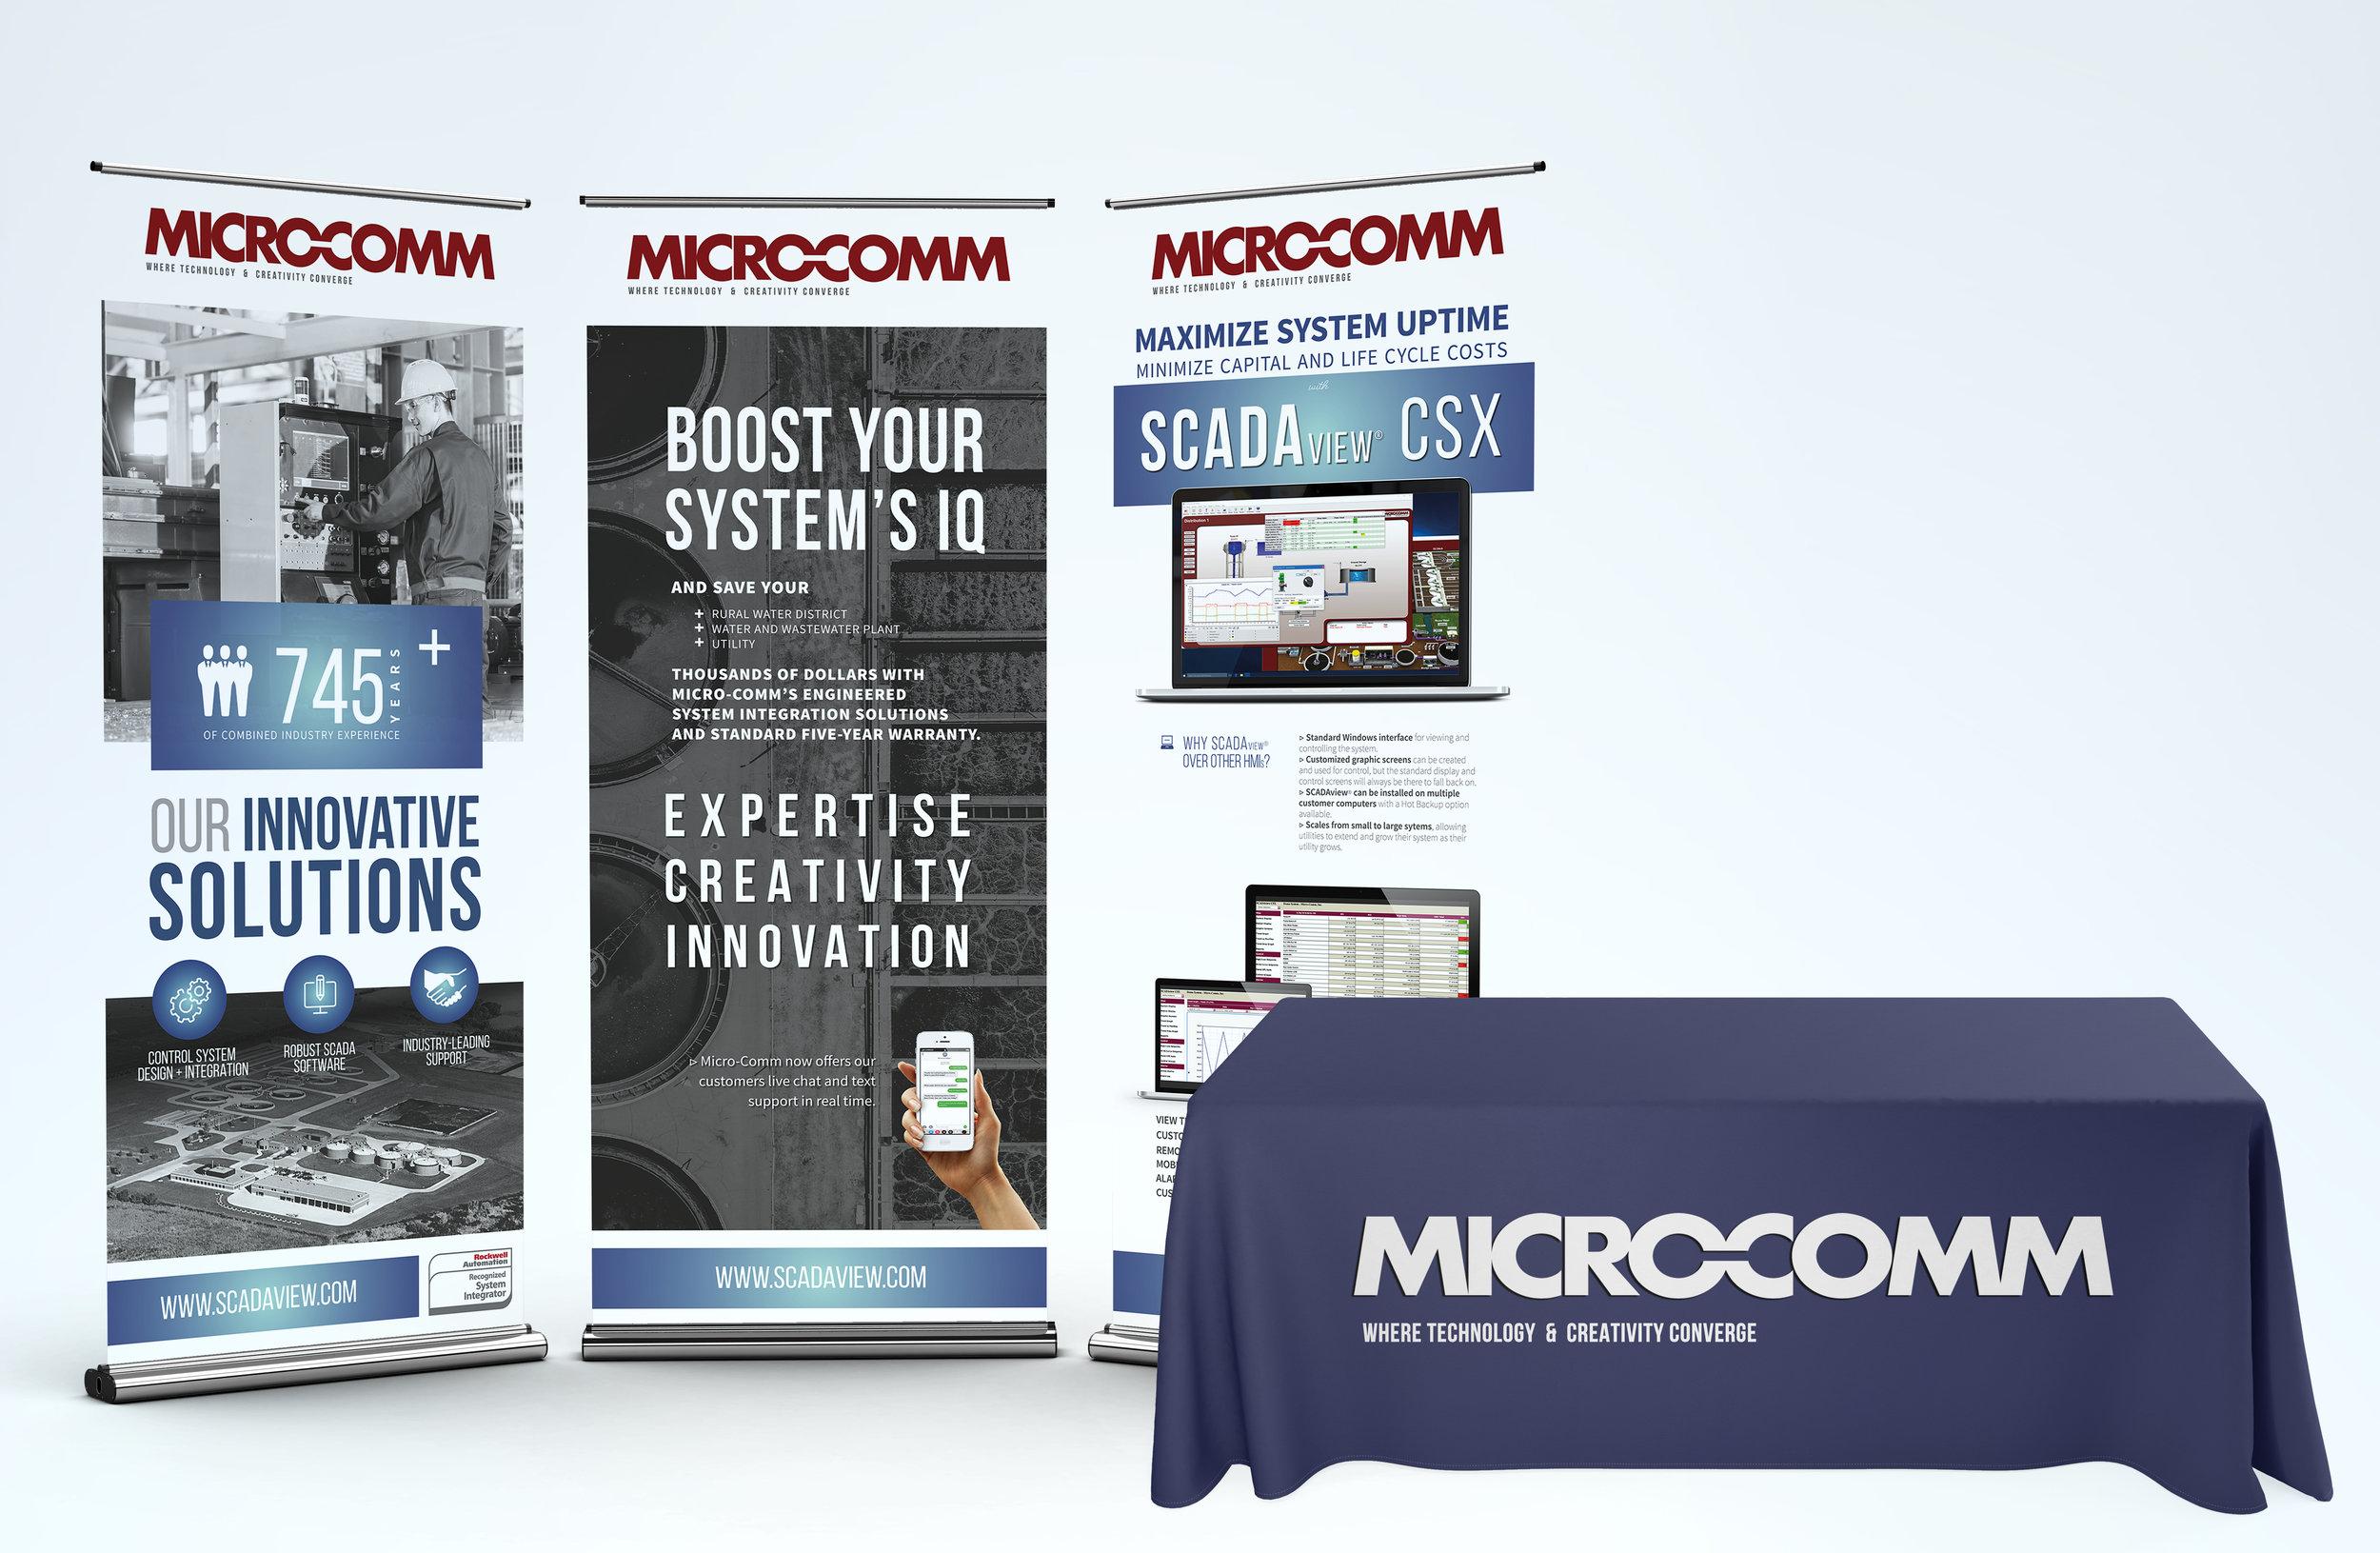 FINAL Microcomm roll-up banner mockup wednesday media copy.jpg